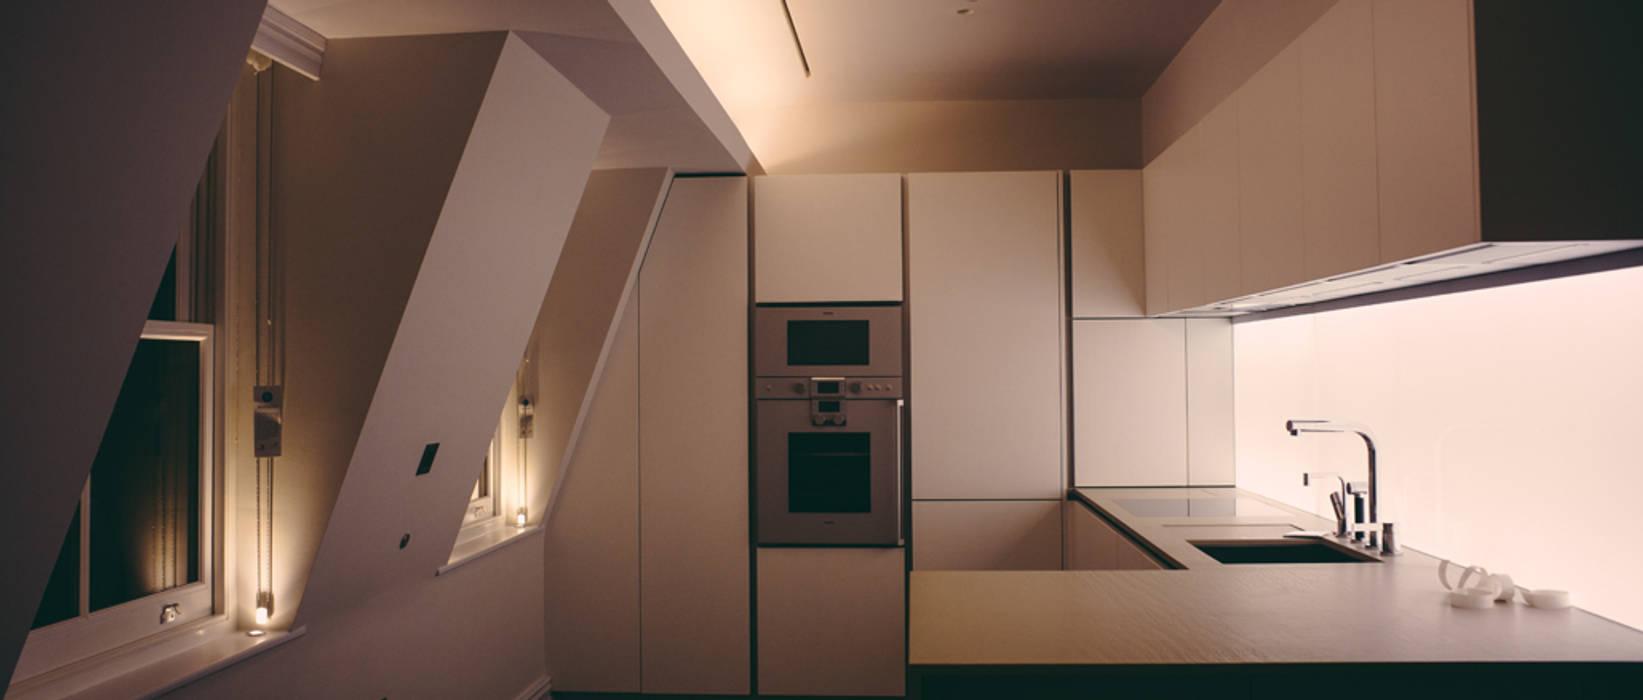 Queens Gate and Queens Gate Mews, London: Casas de estilo  de studio zigzag lighting design, Moderno